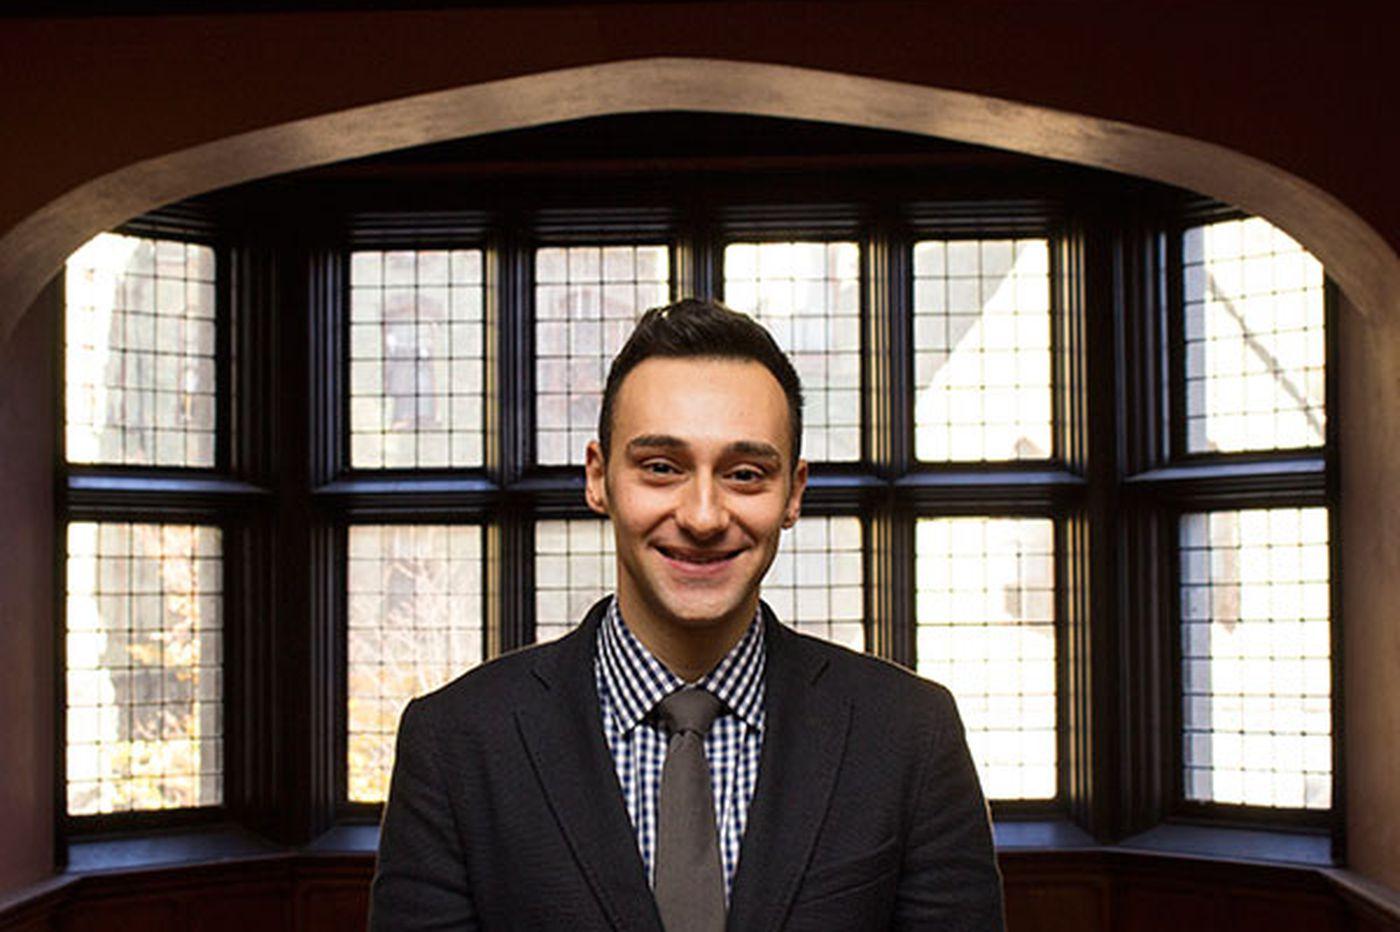 Penn launching LGBT health initiative